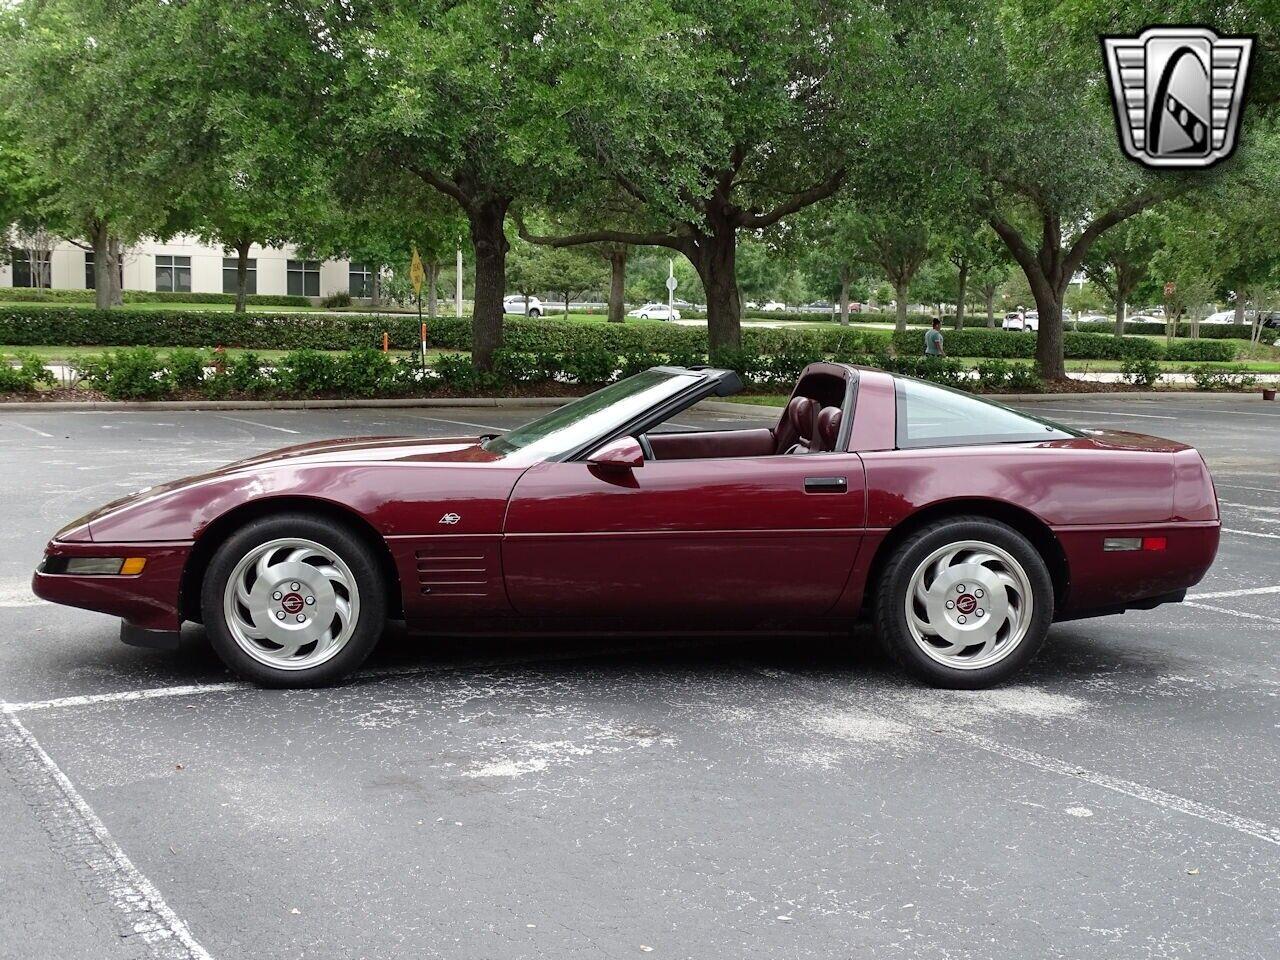 1993 Red Chevrolet Corvette     C4 Corvette Photo 5